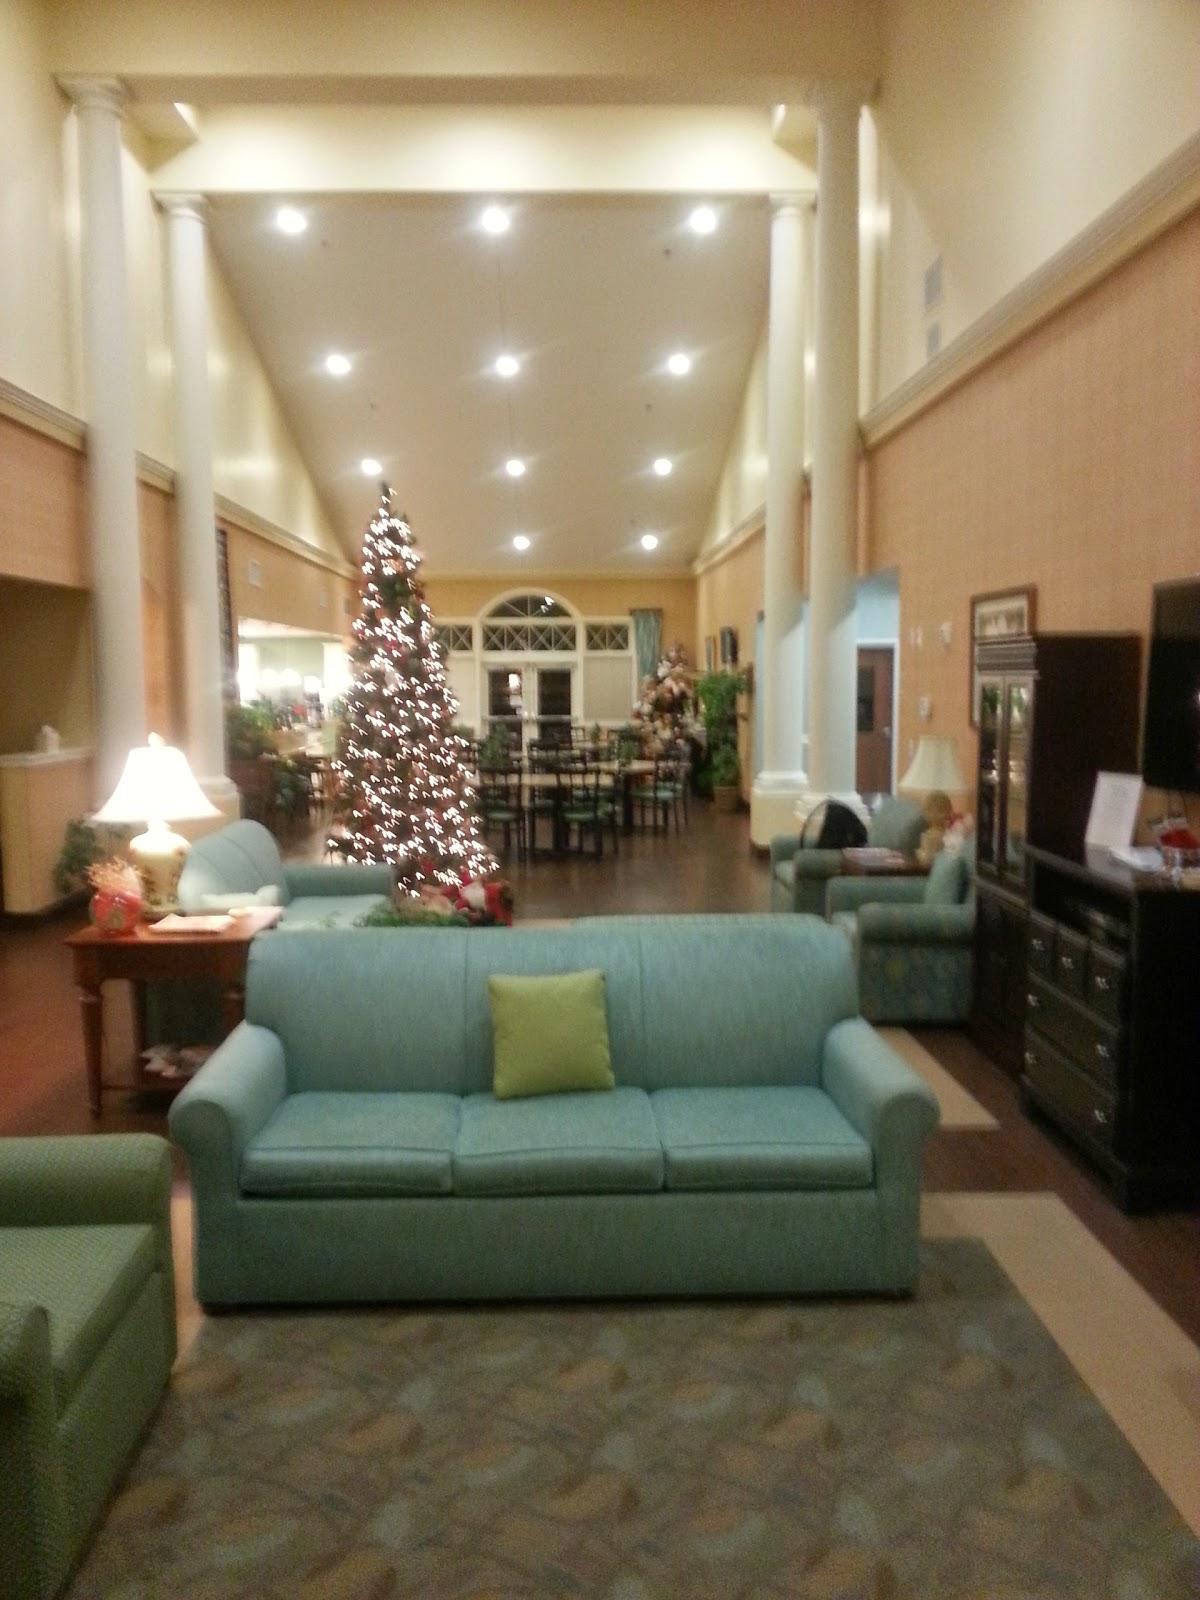 Fairfield Inn & Suites by Marriott Winston-Salem Hanes Mall Map ...